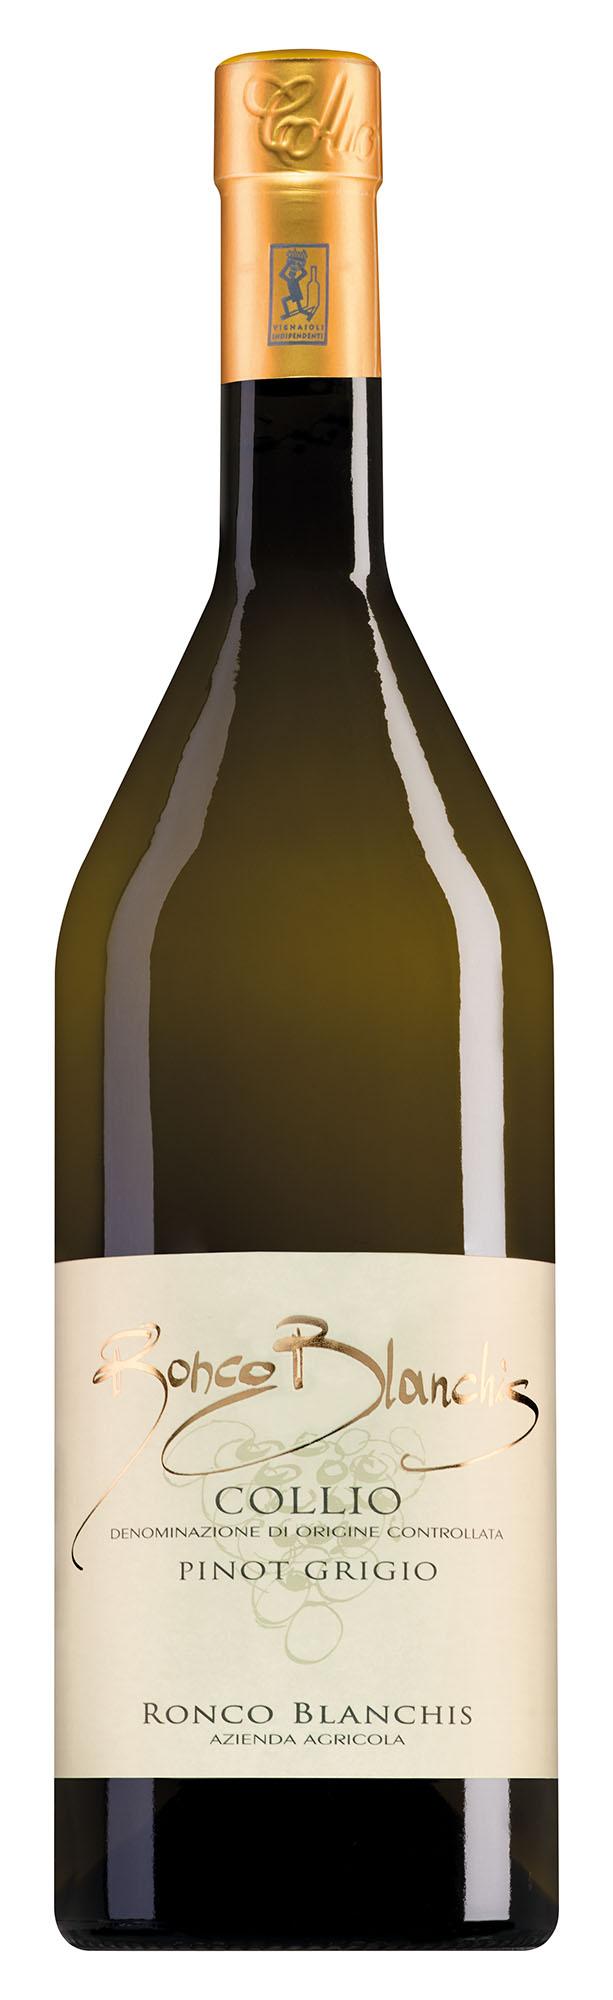 Ronco Blanchis Collio Pinot Grigio